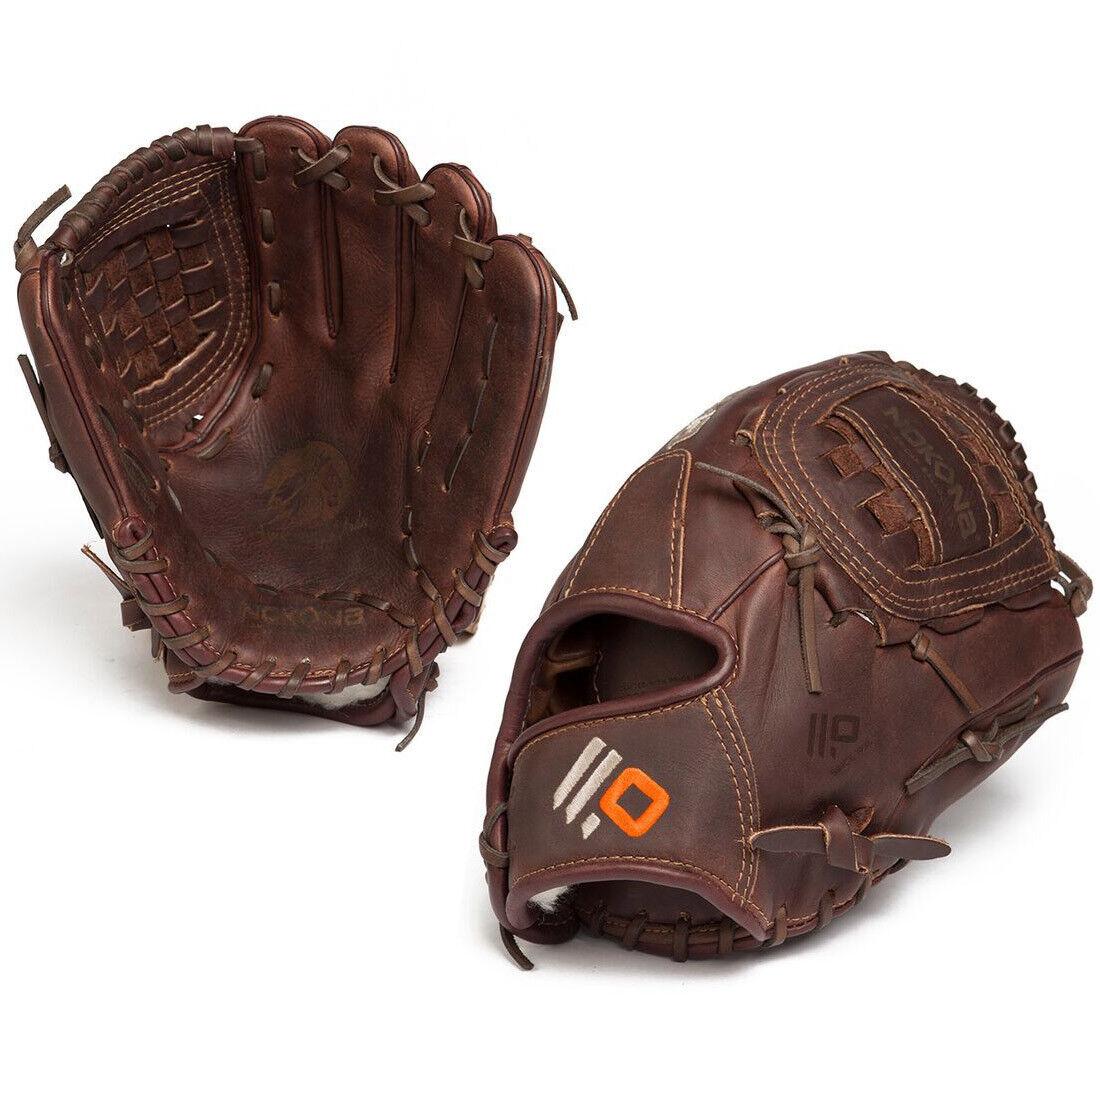 Nokona X2 Elite Serie 12 pulgadas de X2-1200 Guante de pulgadas béisbol 98f61c